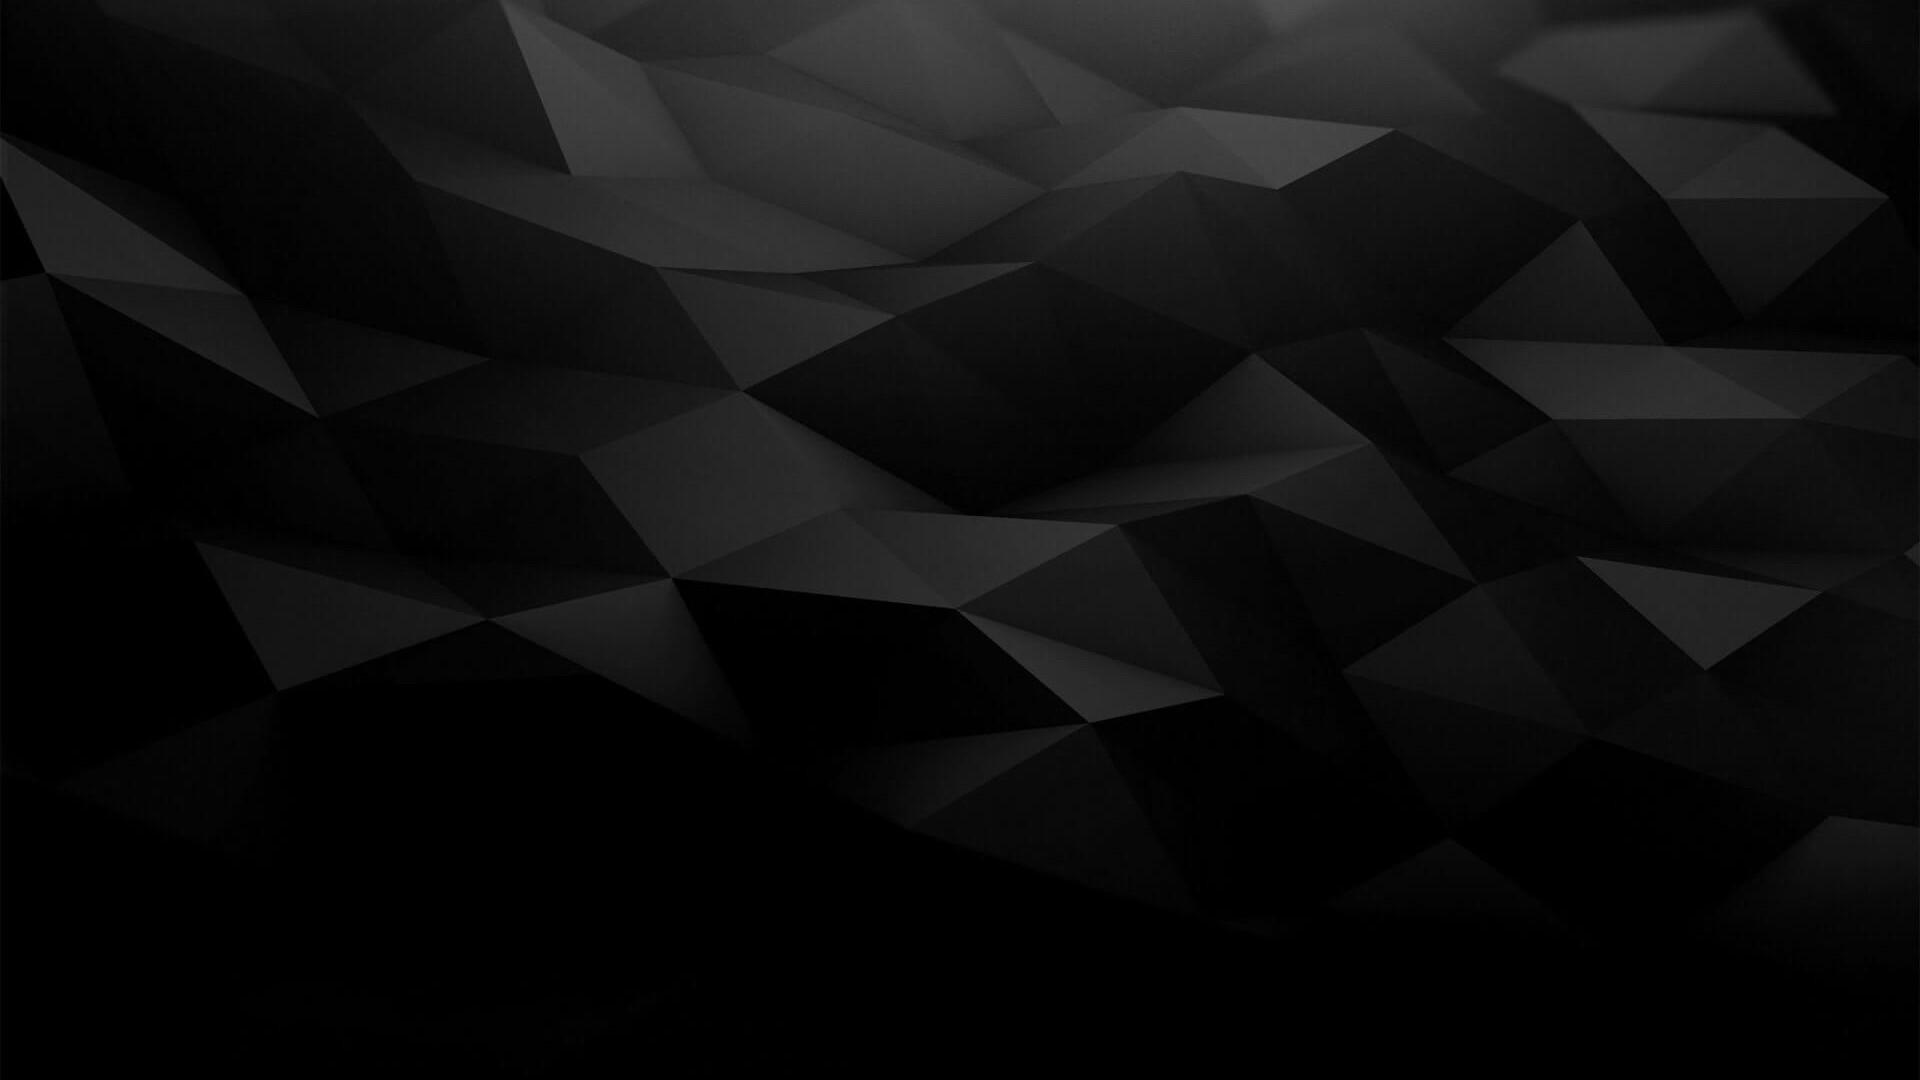 black poly background